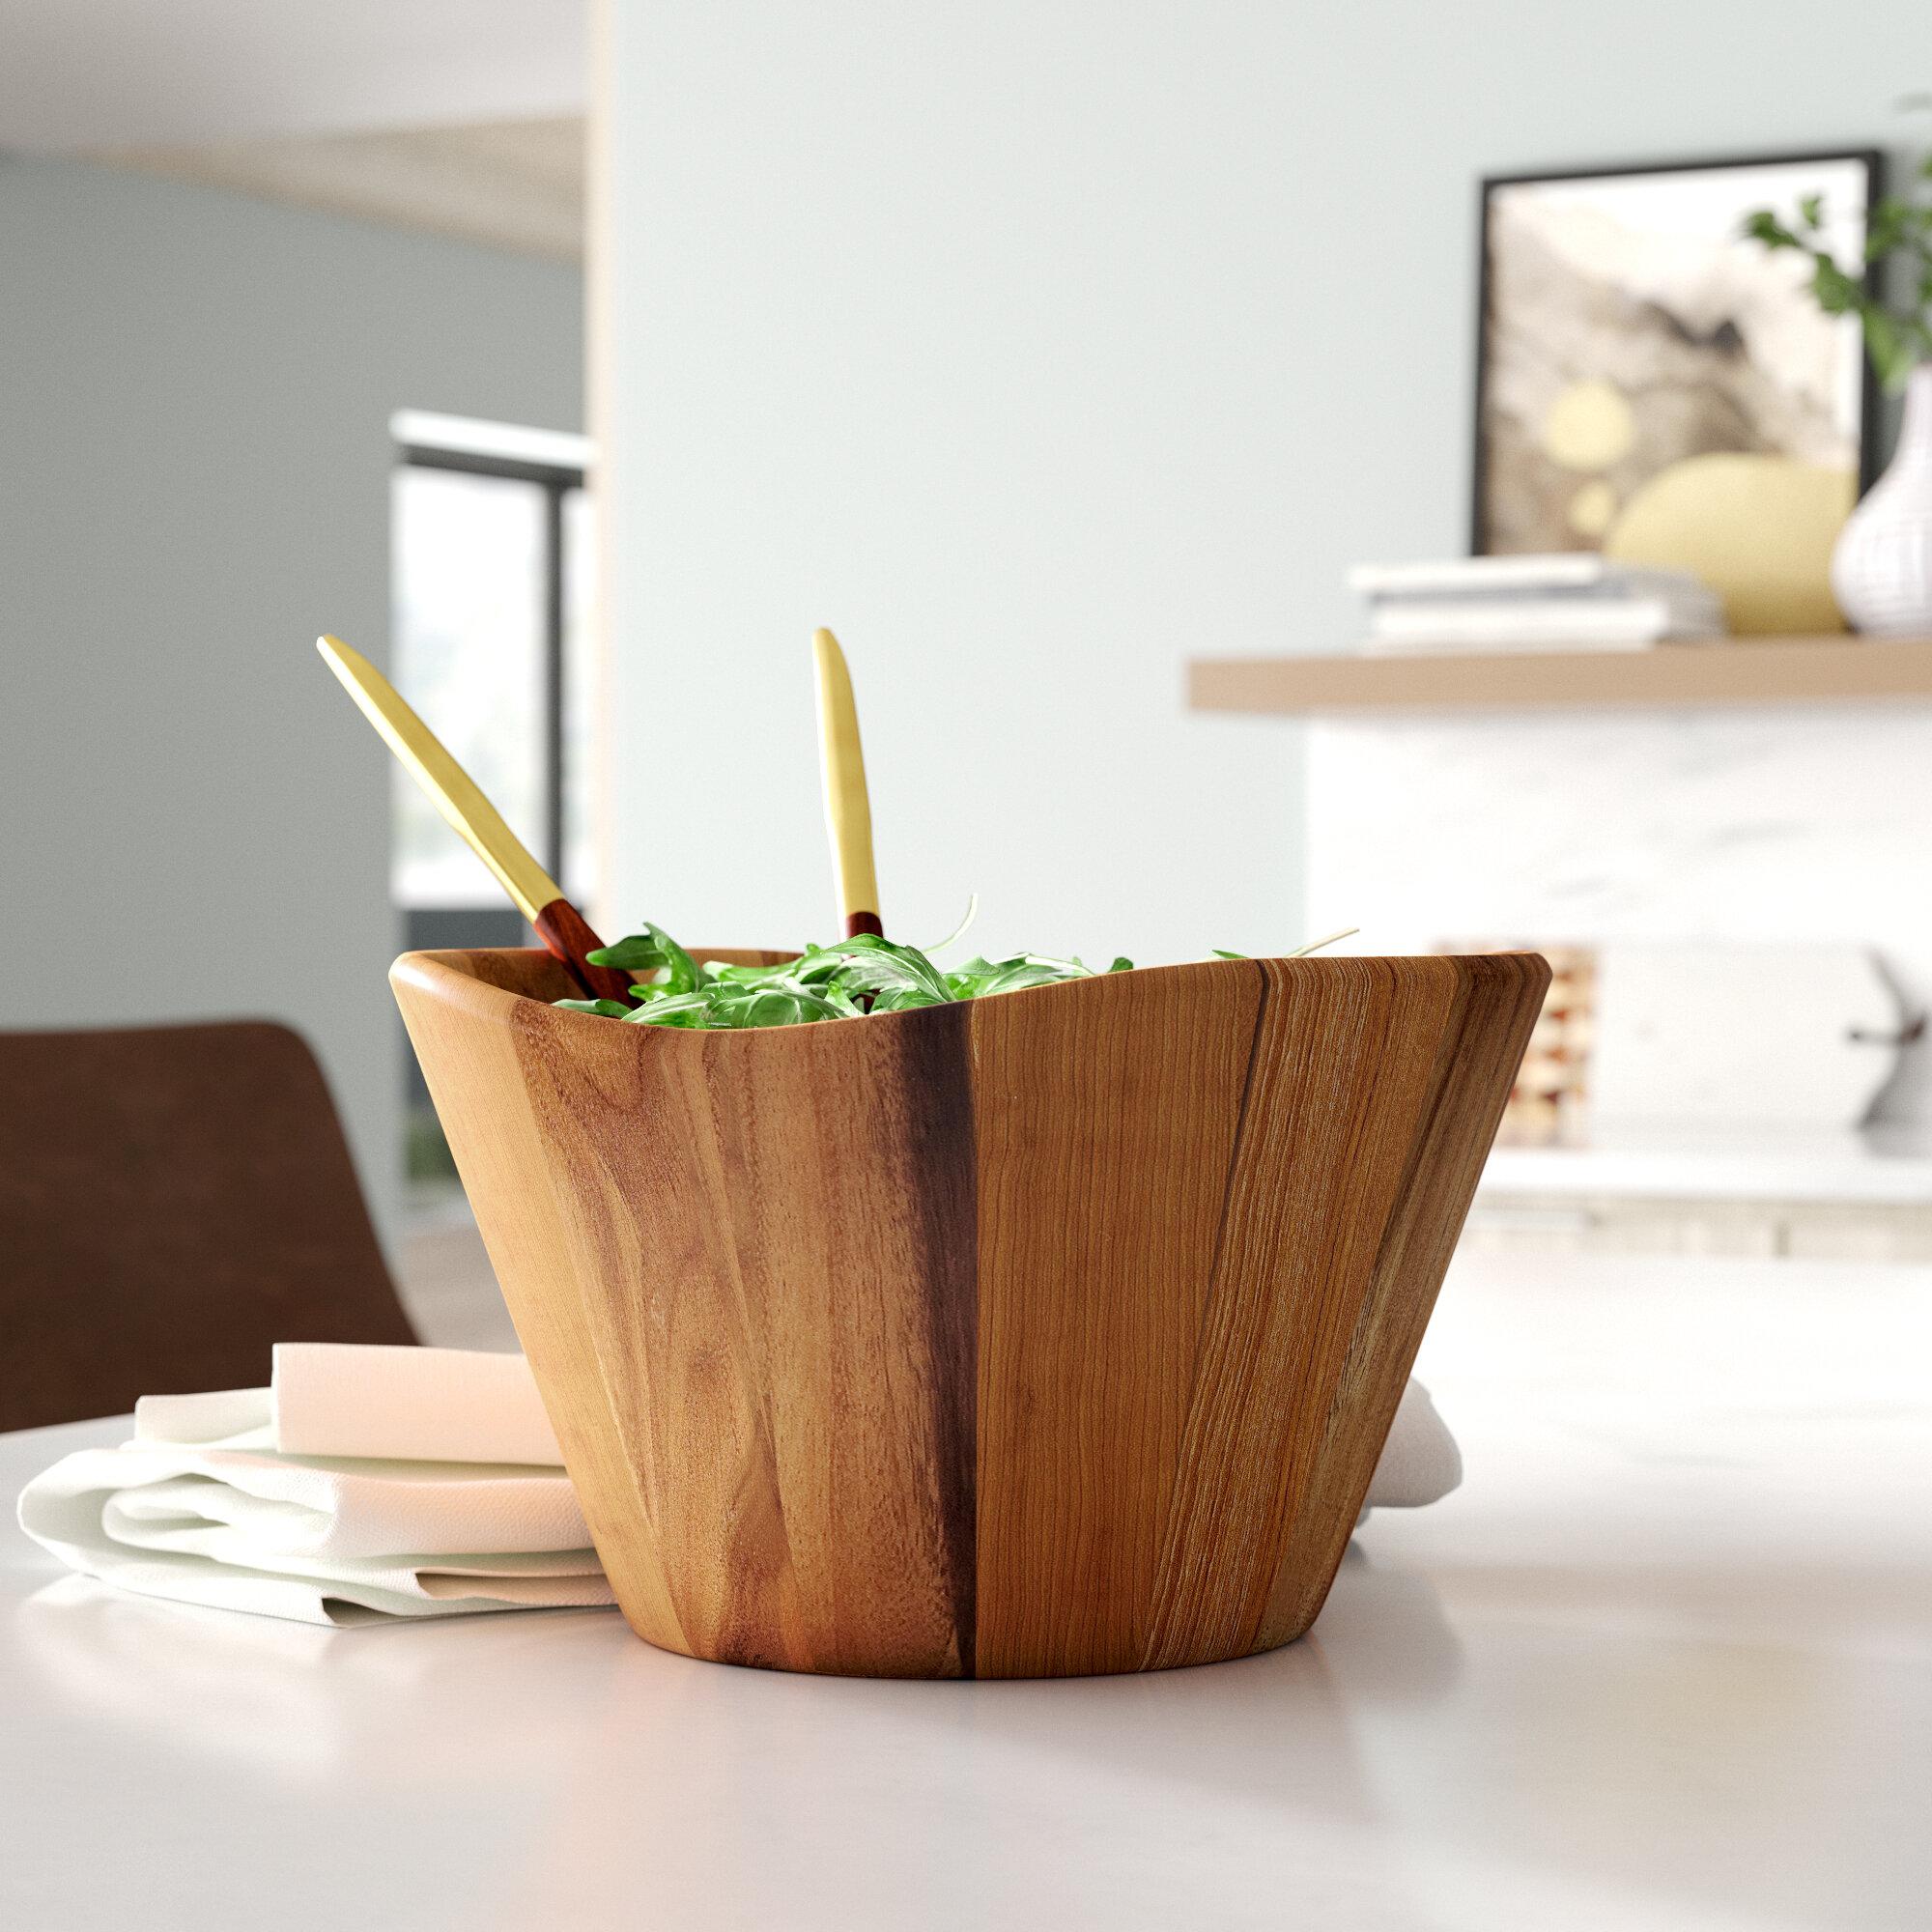 Set of 4 Lipper International Wooden Acacia Wave Shape Salad Serveware Bowl